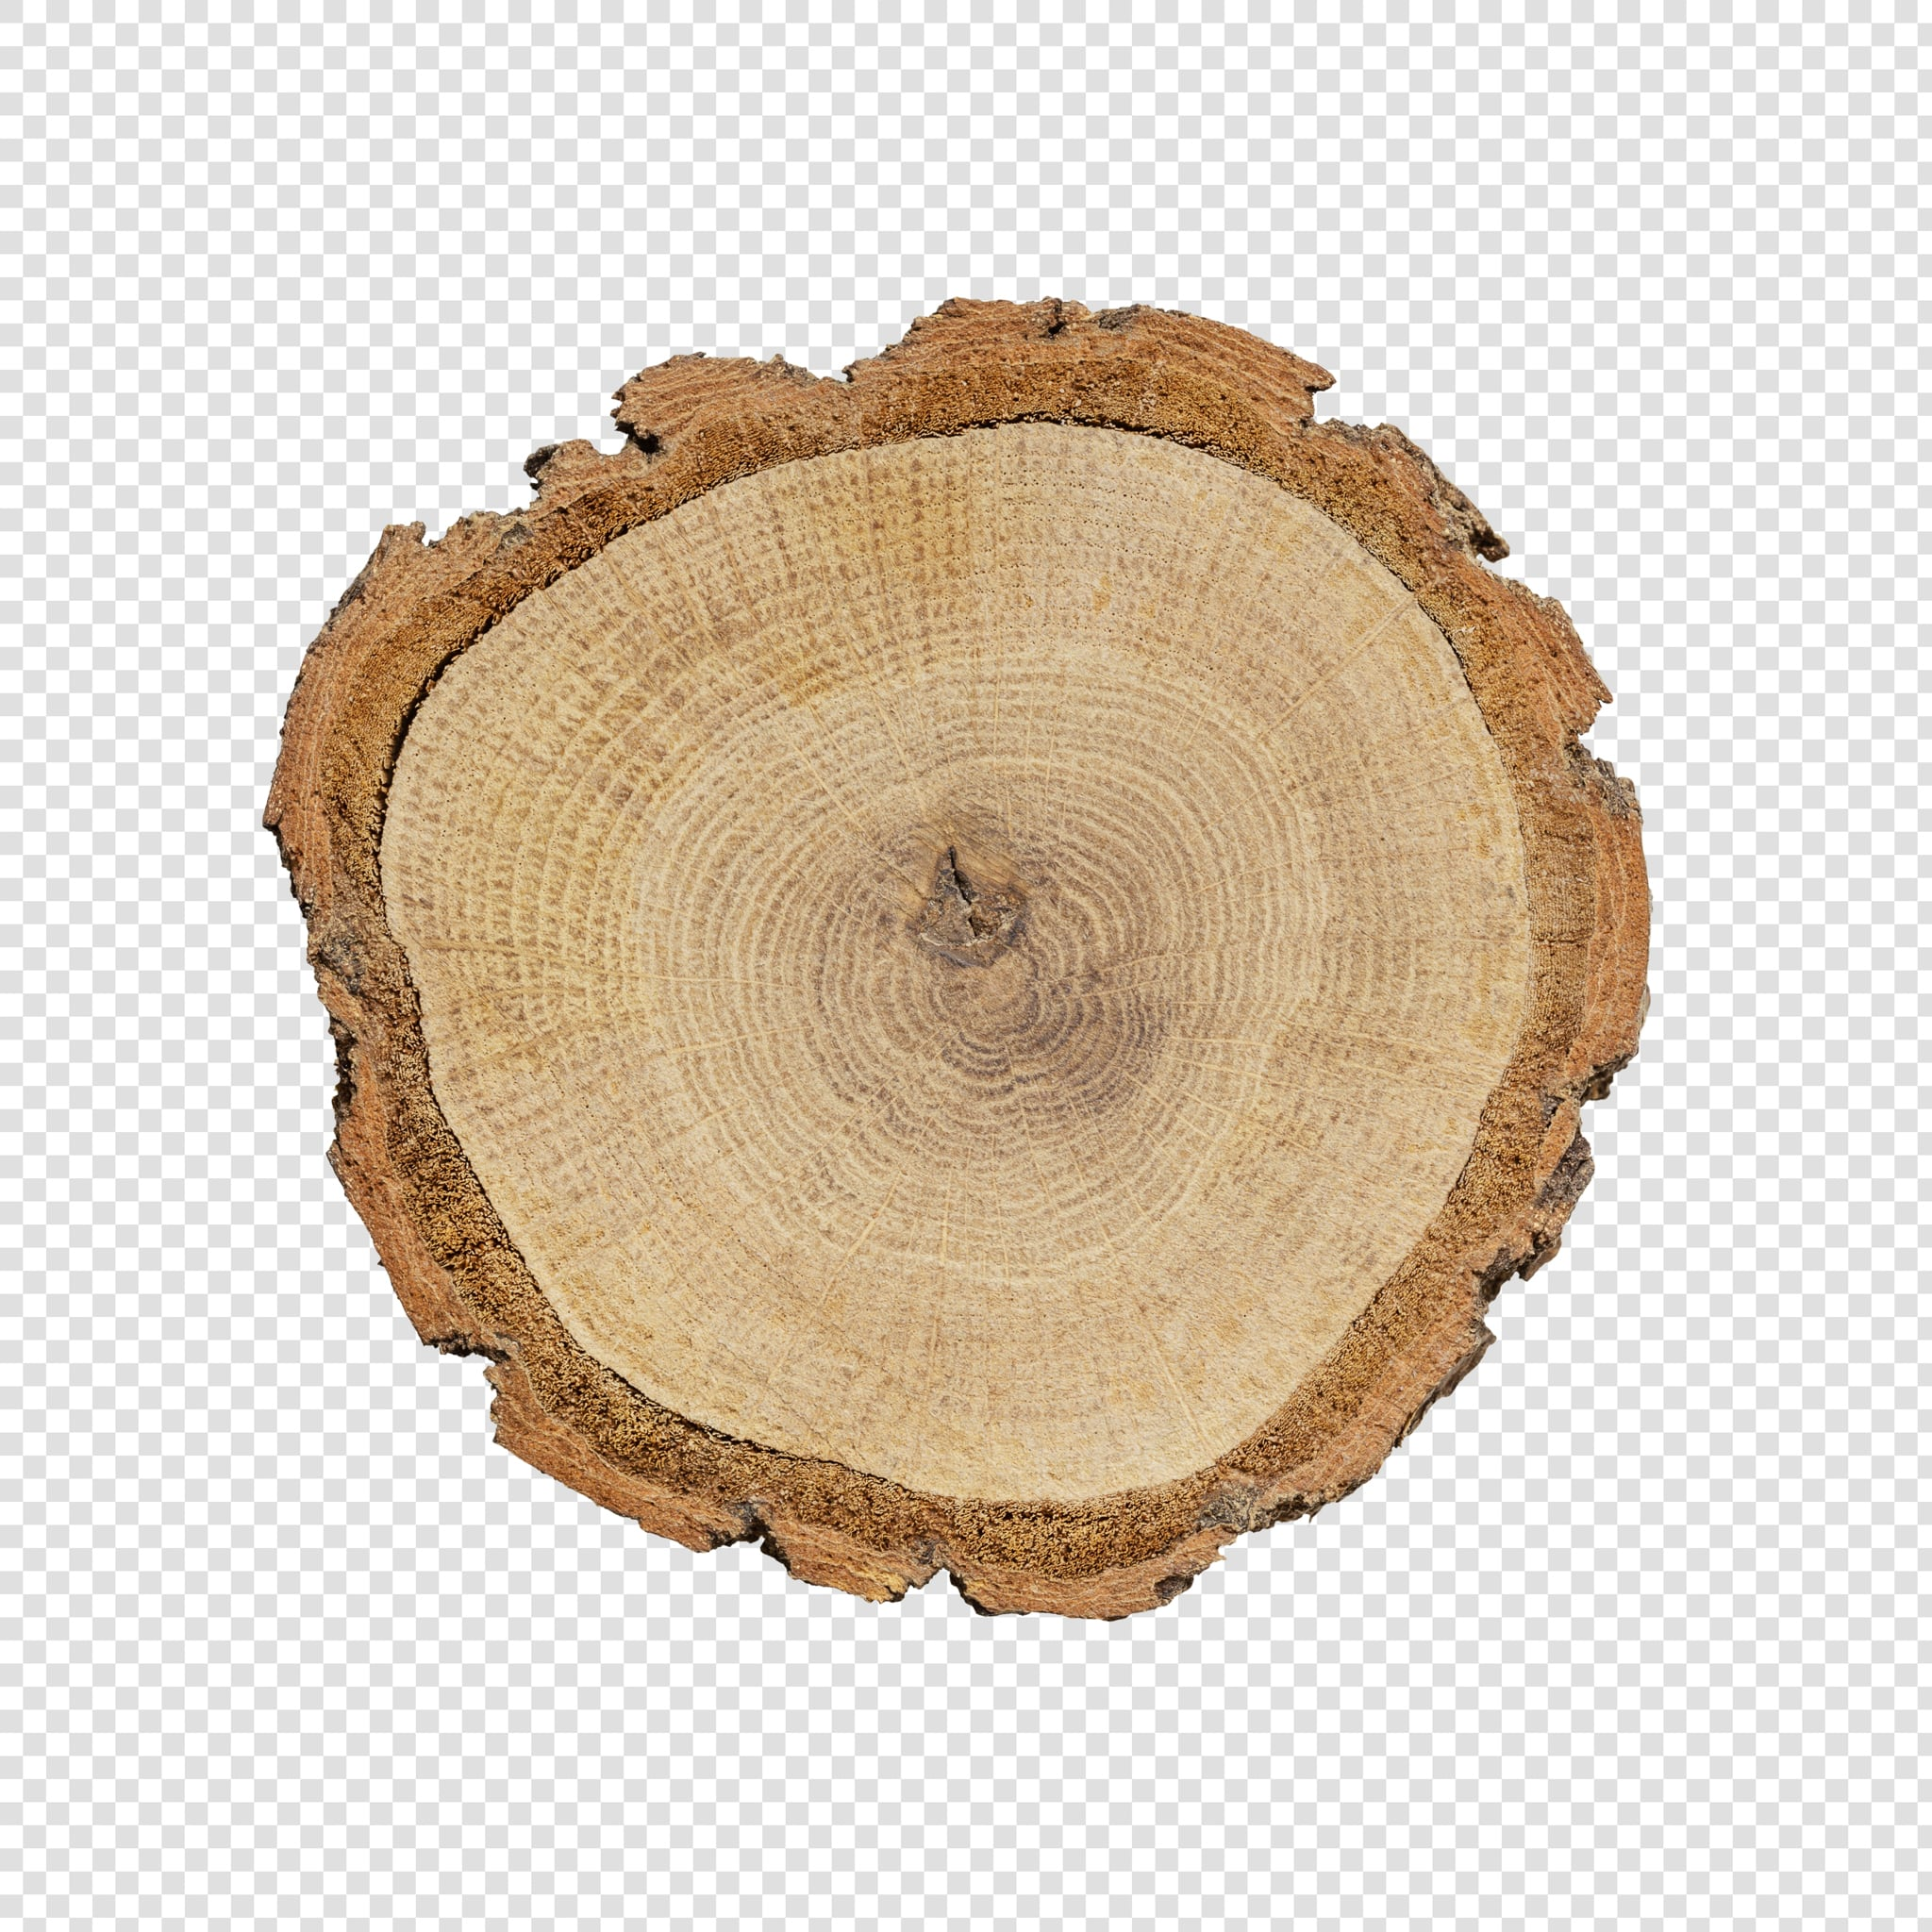 Isolated Wood slice psd image